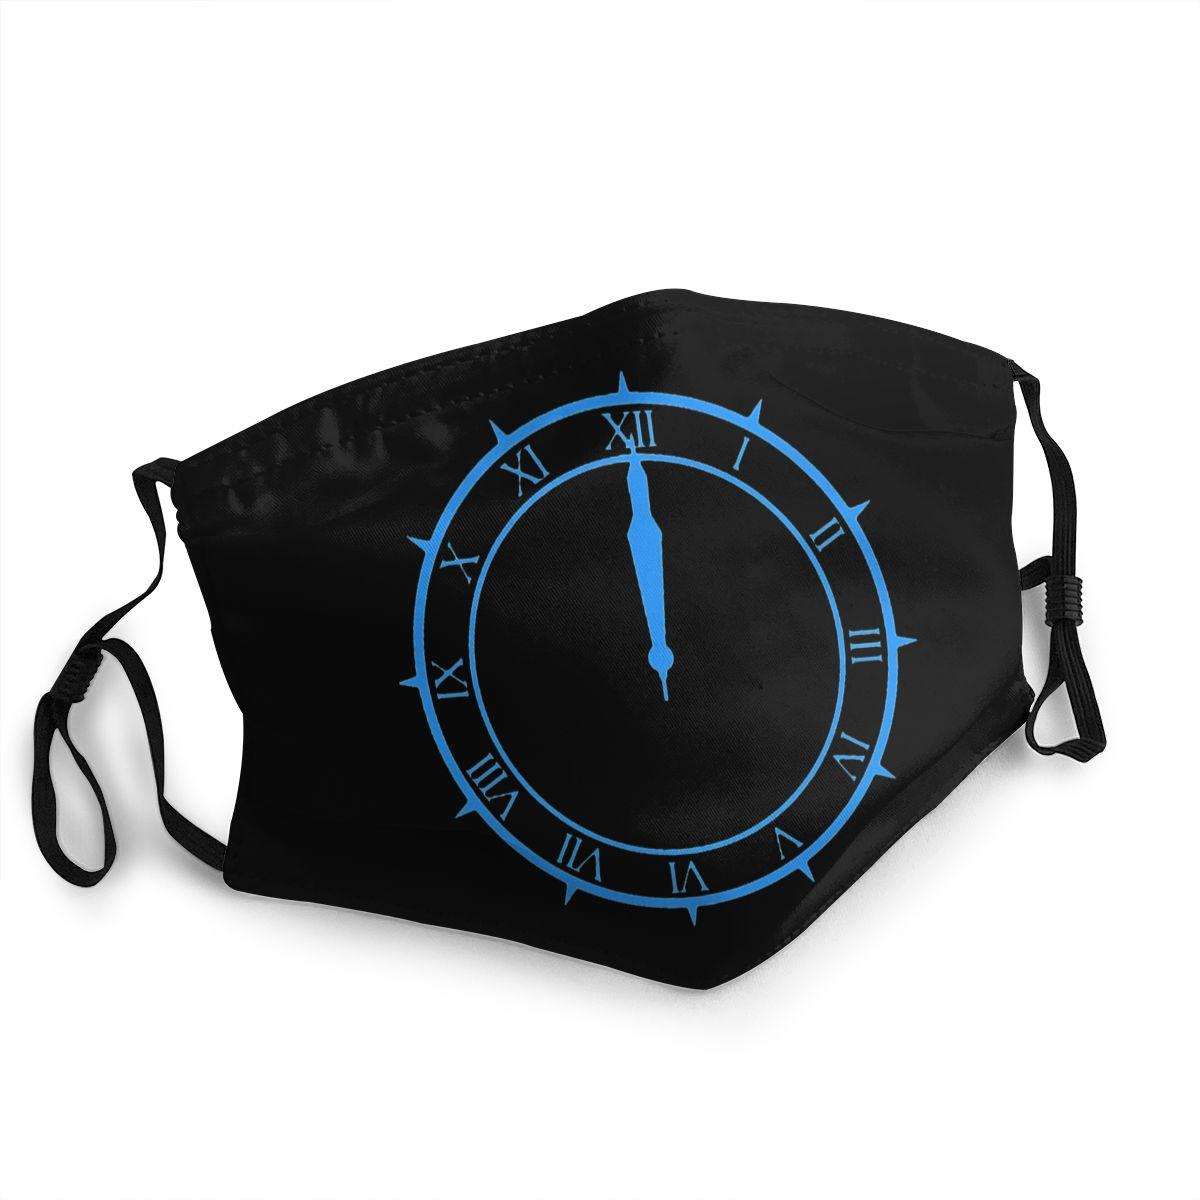 Fashion Face Mask Persona 3 Clock Anti Dust Persona 5 Facial Protective